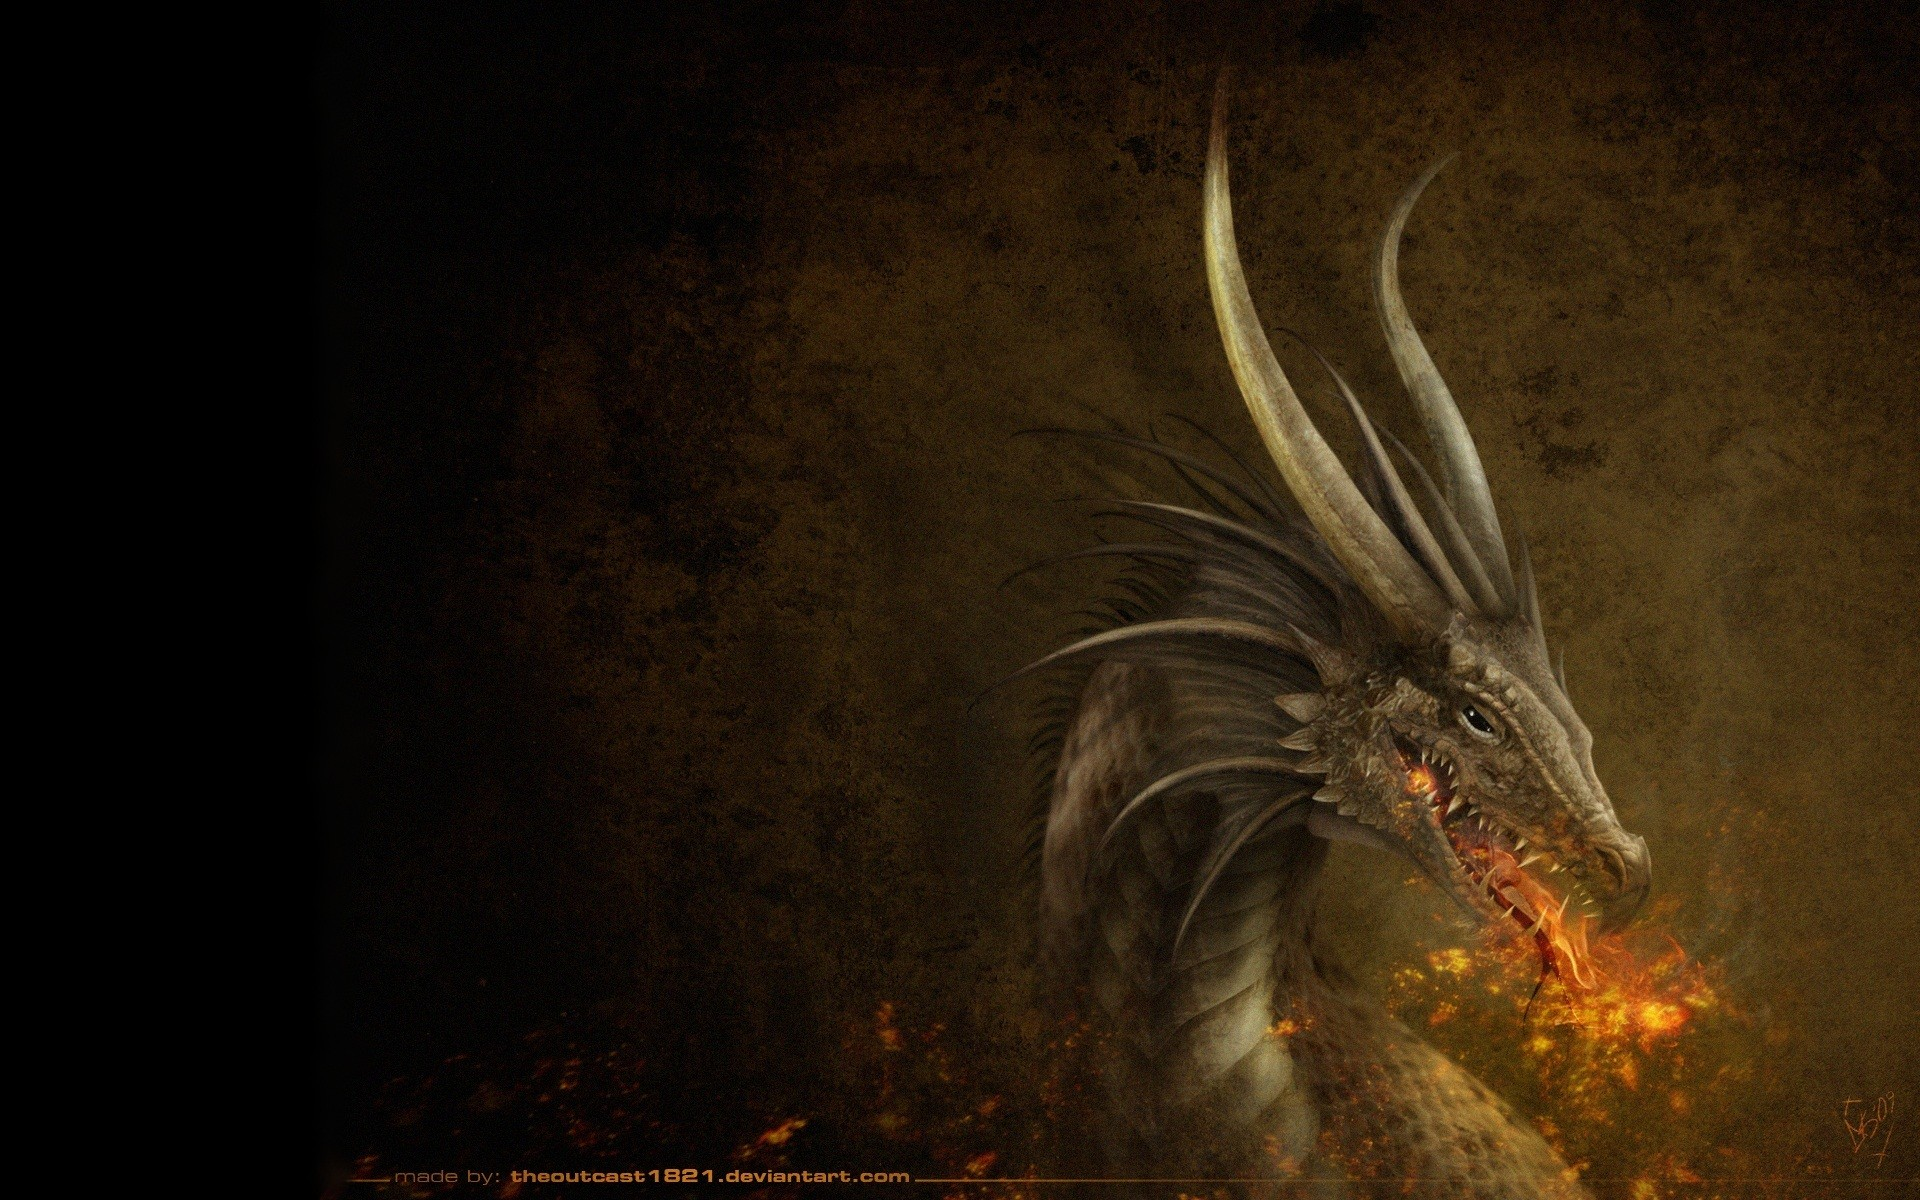 wallpaper fire dragons dragon images 1920x1200 1920x1200